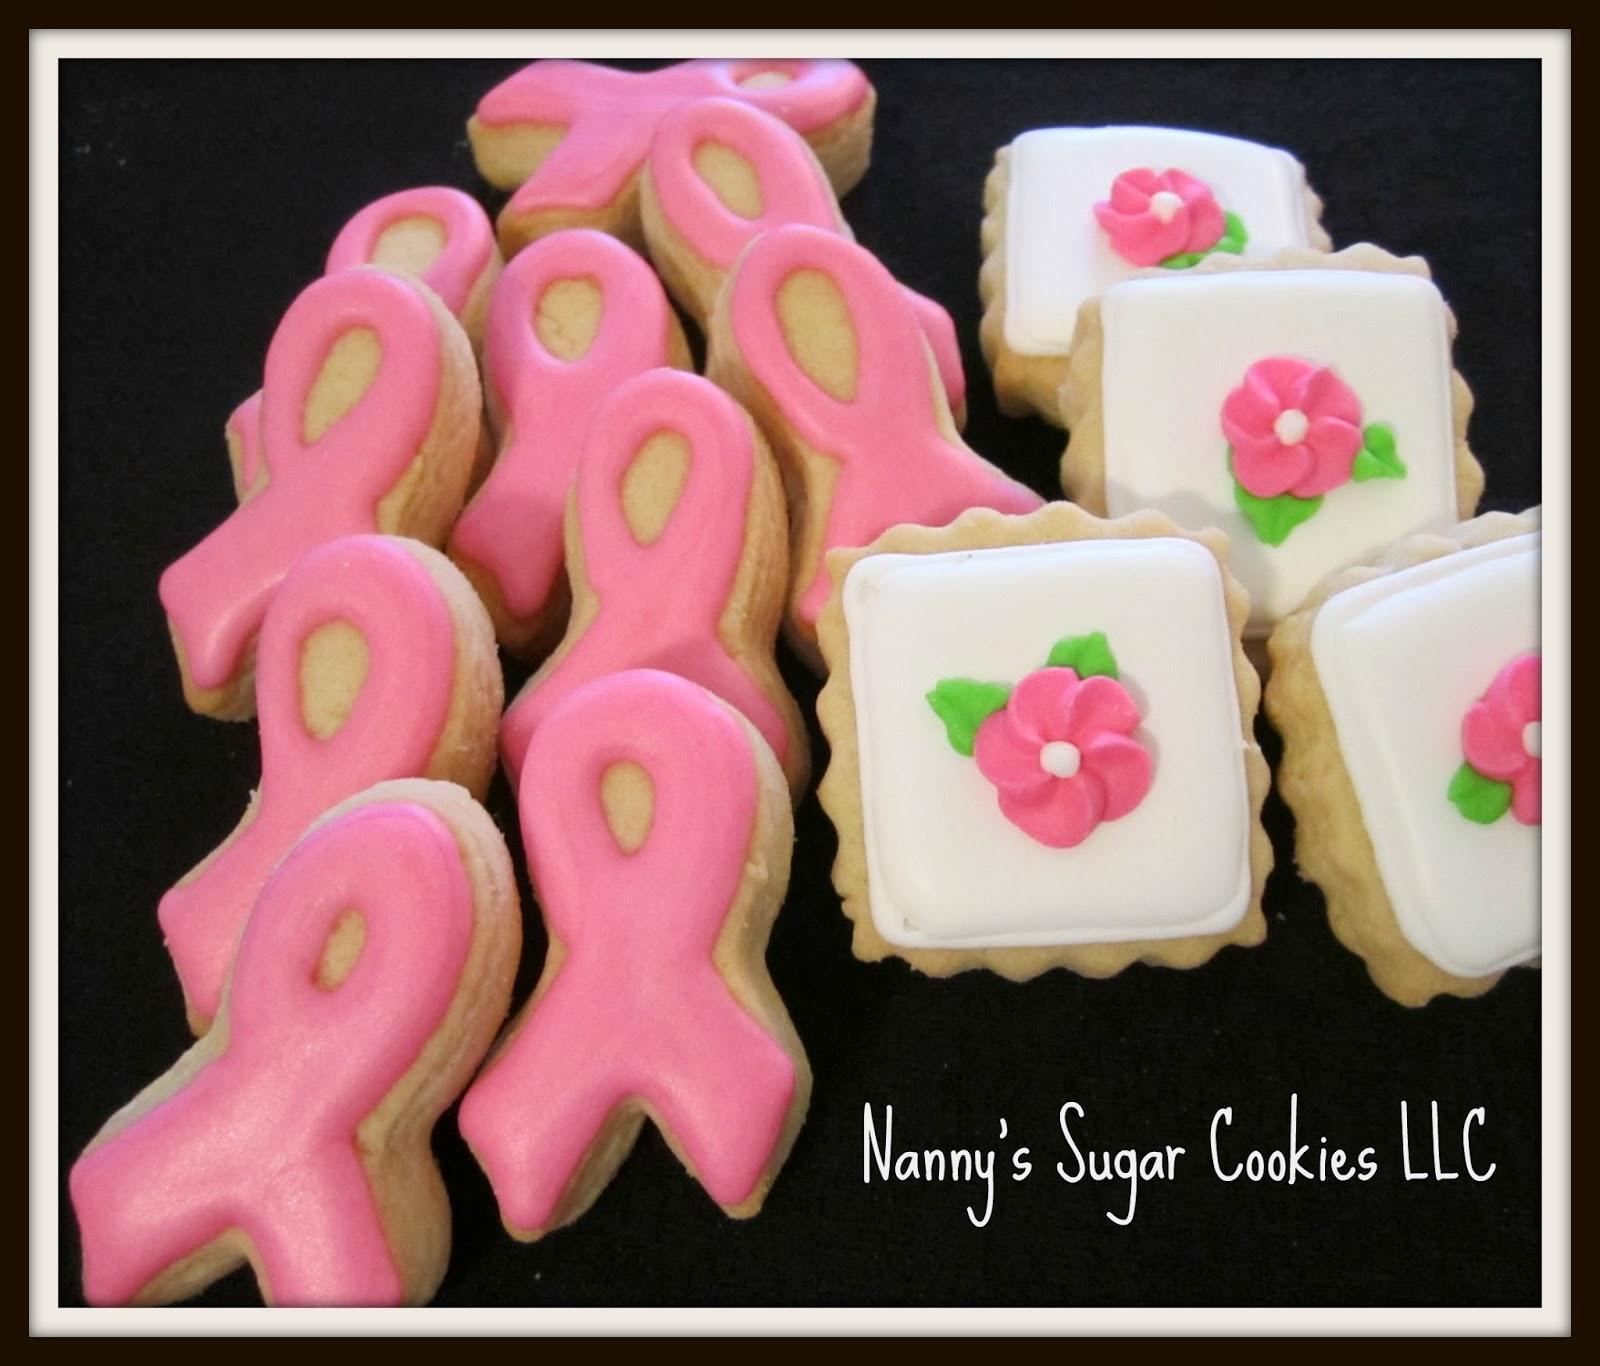 Nanny's Sugar Cookies LLC: October is National Breast ...